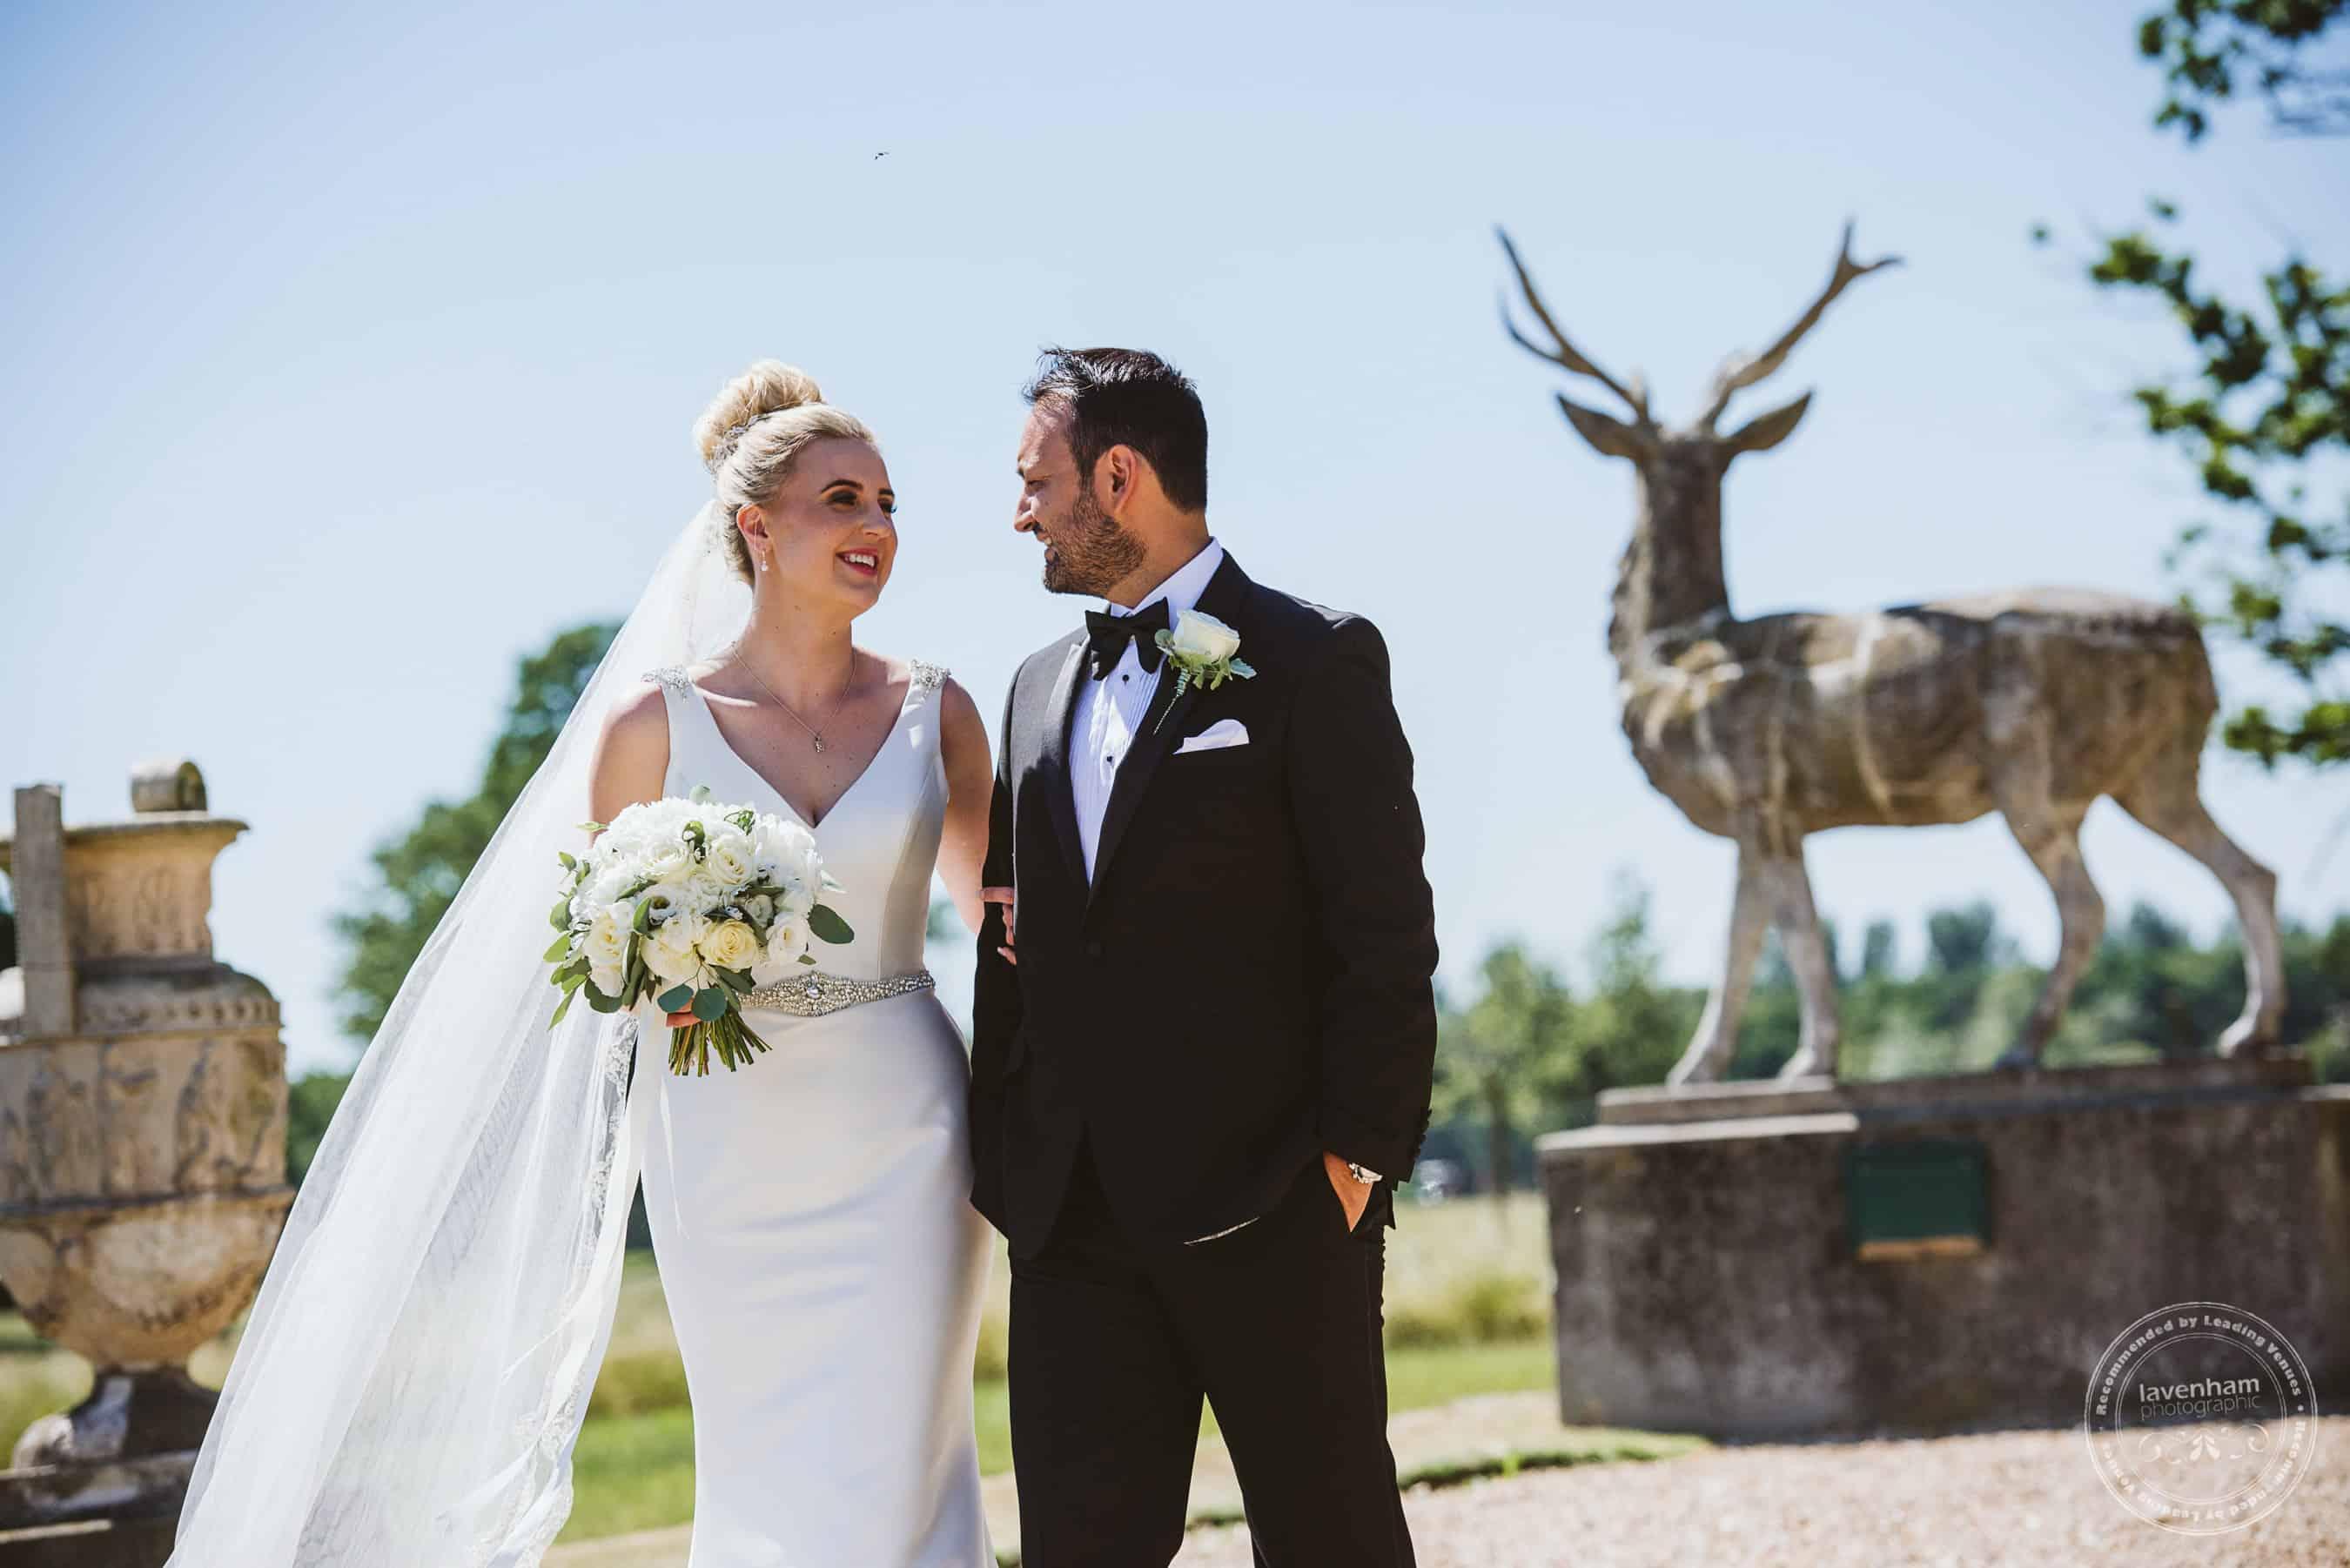 220618 Gosfield Hall Wedding Photography Lavenham Photographic 0131